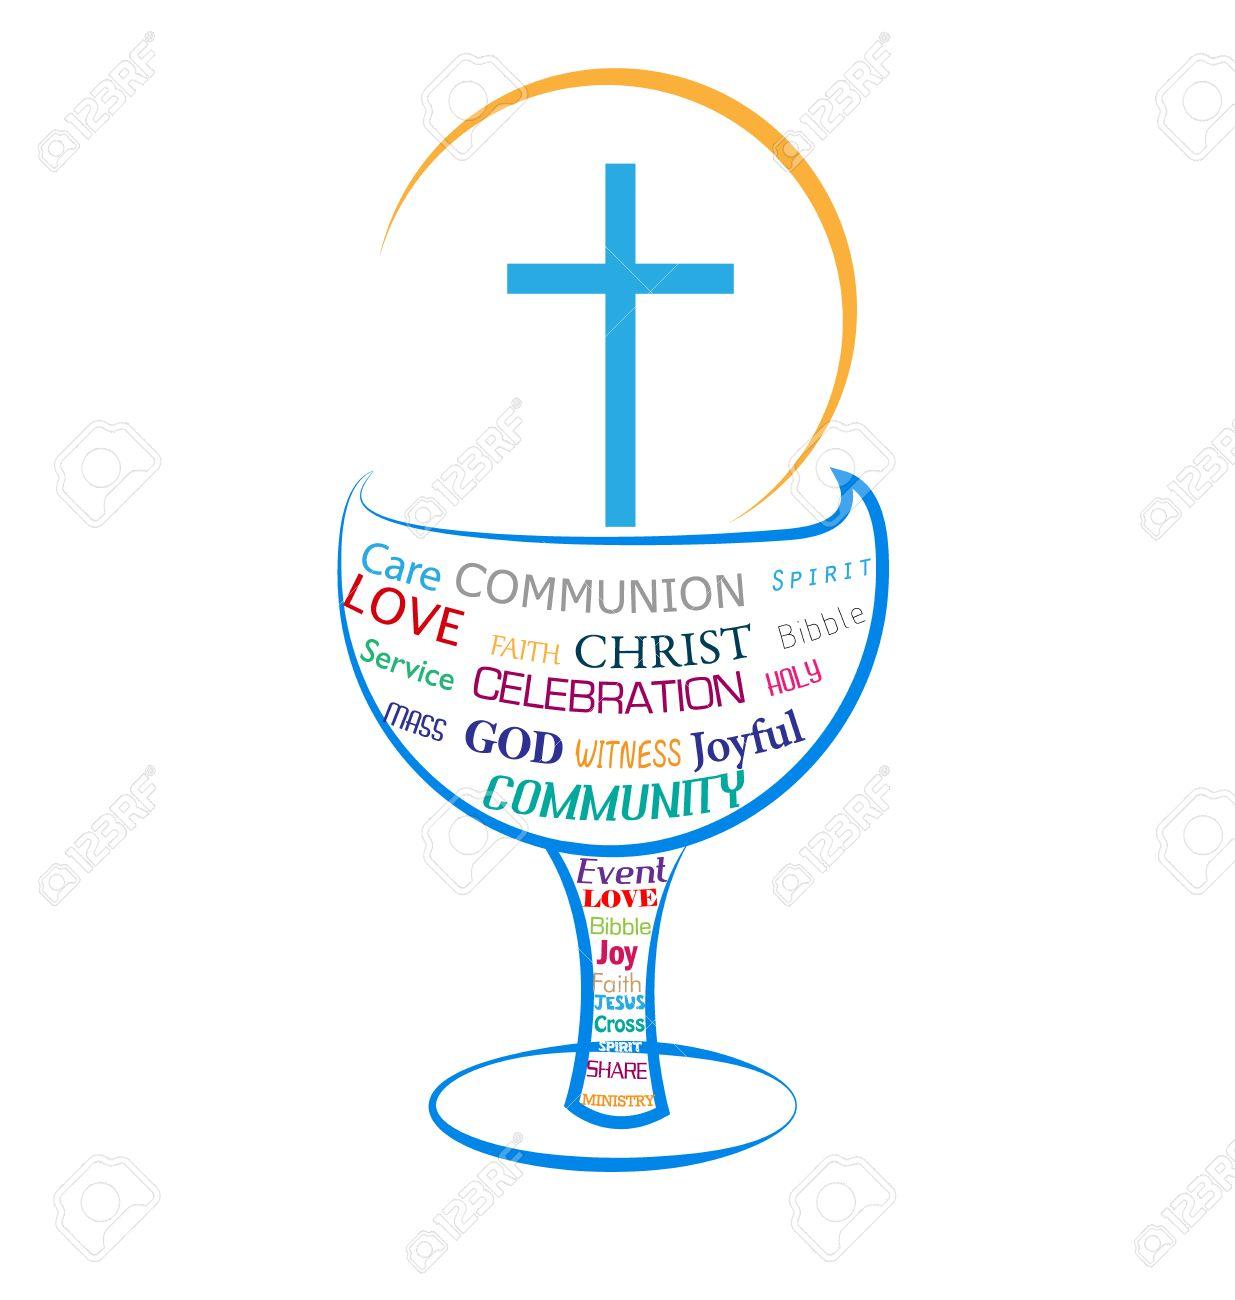 Eucharist holy communion symbol royalty free cliparts vectors and eucharist holy communion symbol stock vector 62464270 buycottarizona Image collections